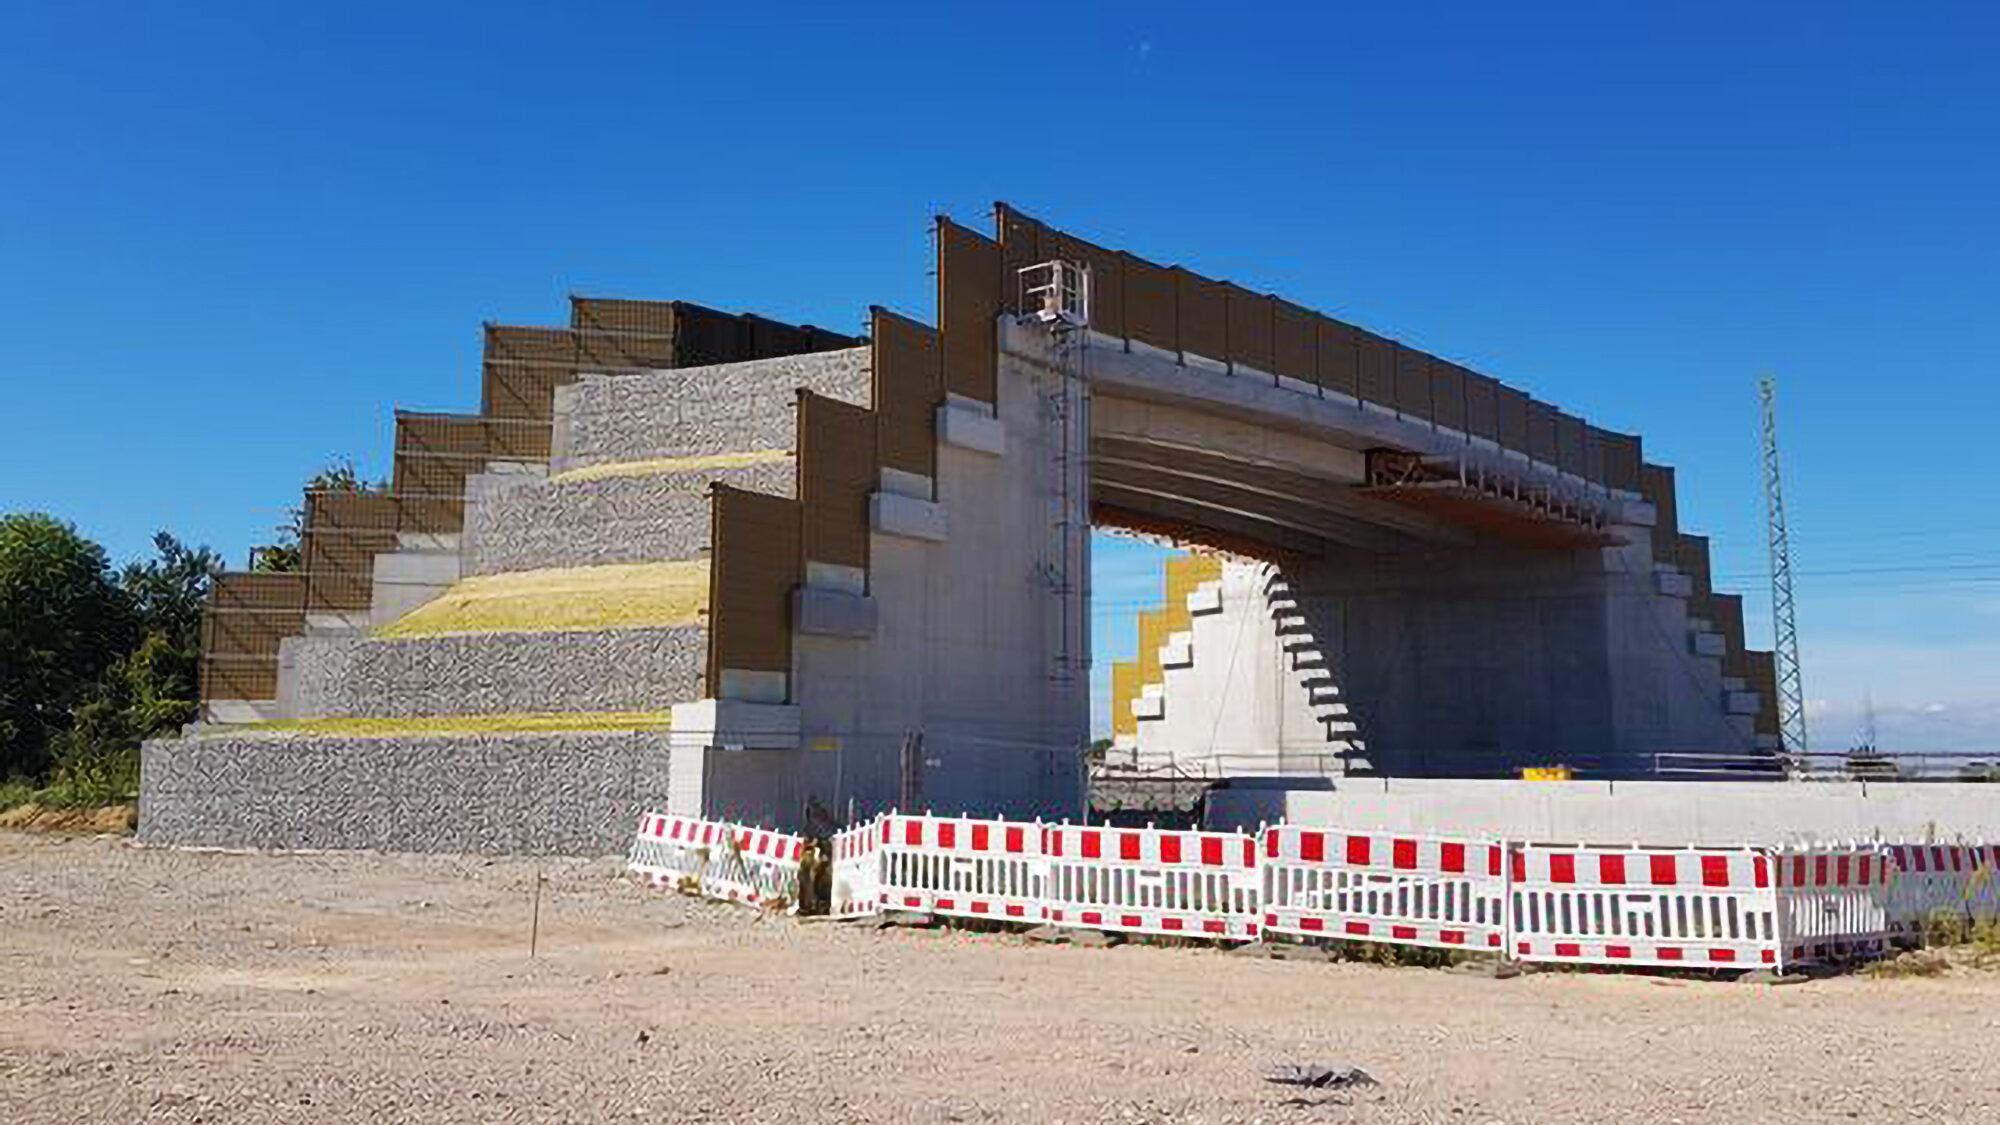 How Did the Bat Cross the Train Tracks? Germany Built a $1.8 Million Bridge